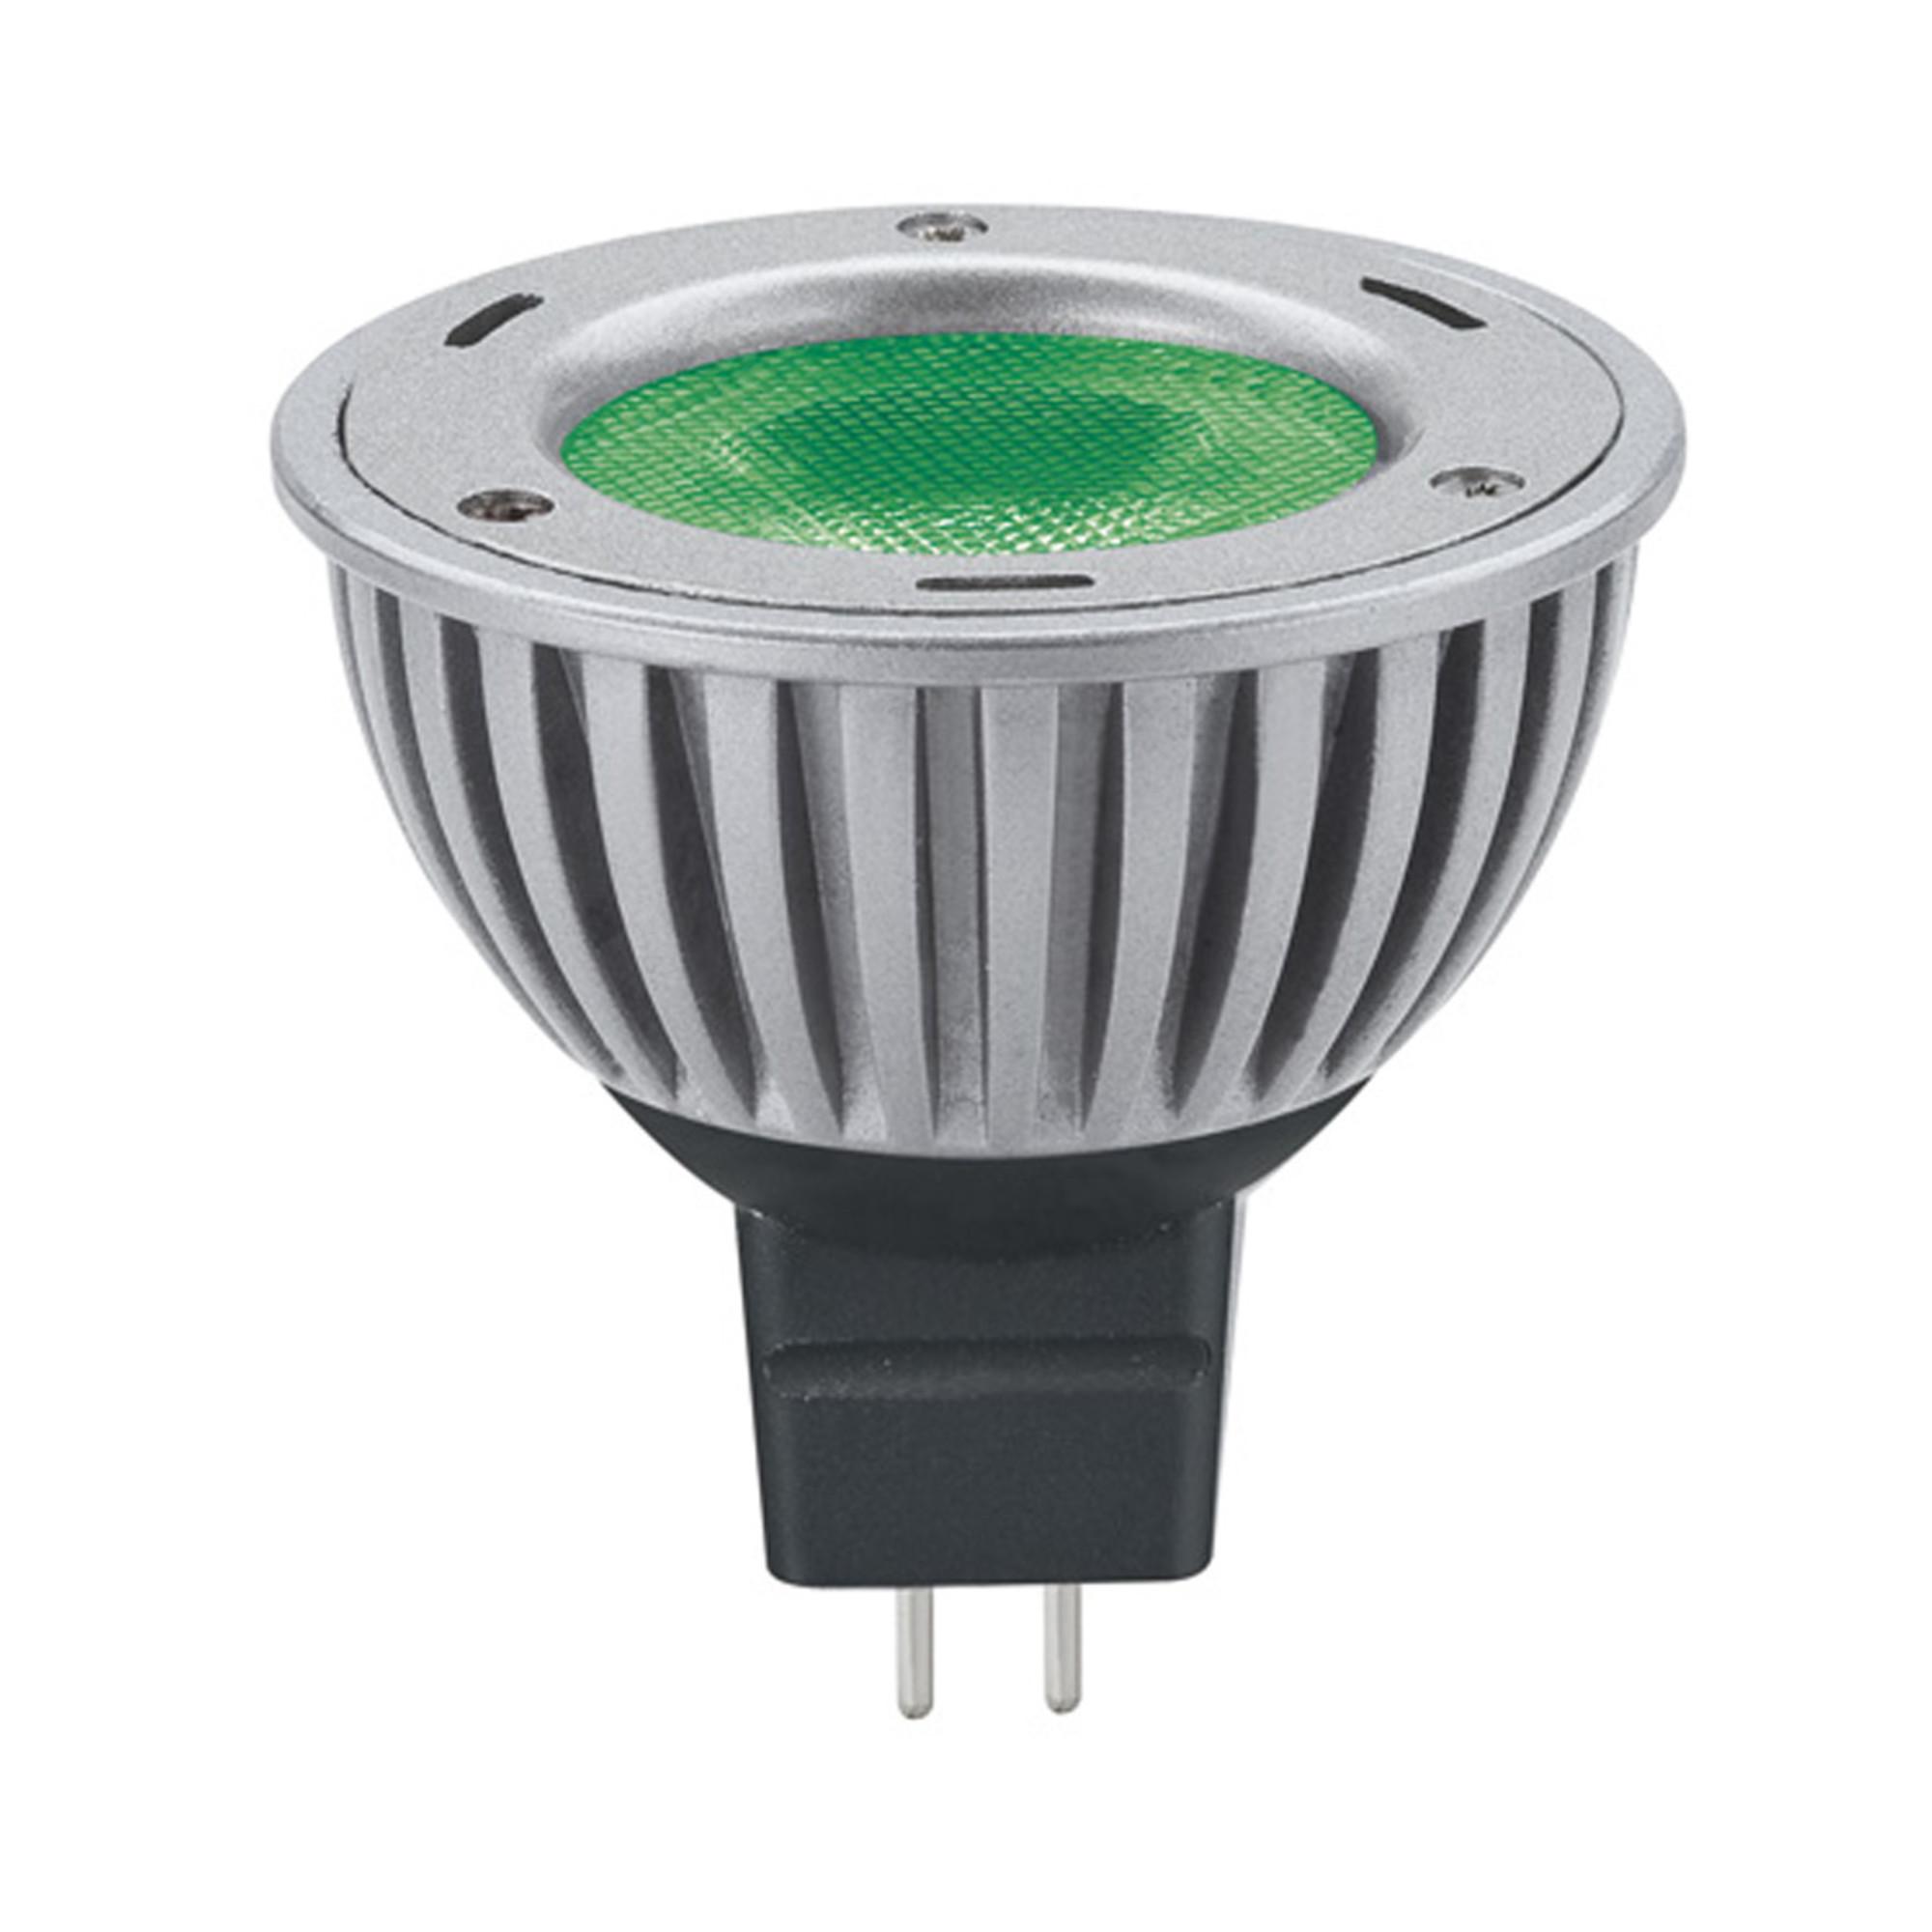 Лампа светодиодная Paulmann 28059 GU5.3 60 Лм зеленый свет